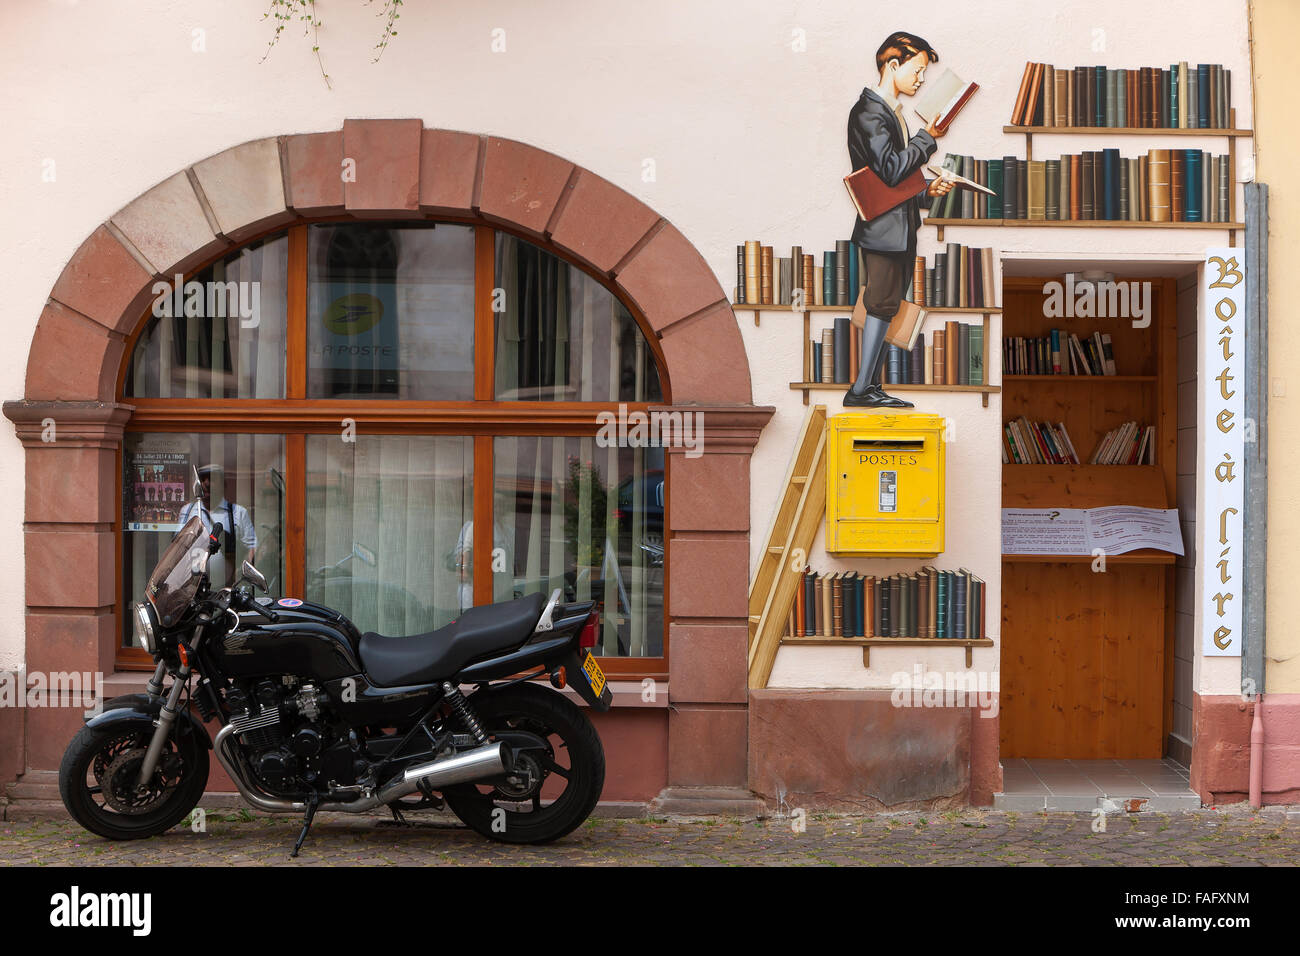 Painted Bookstore façade - Stock Image